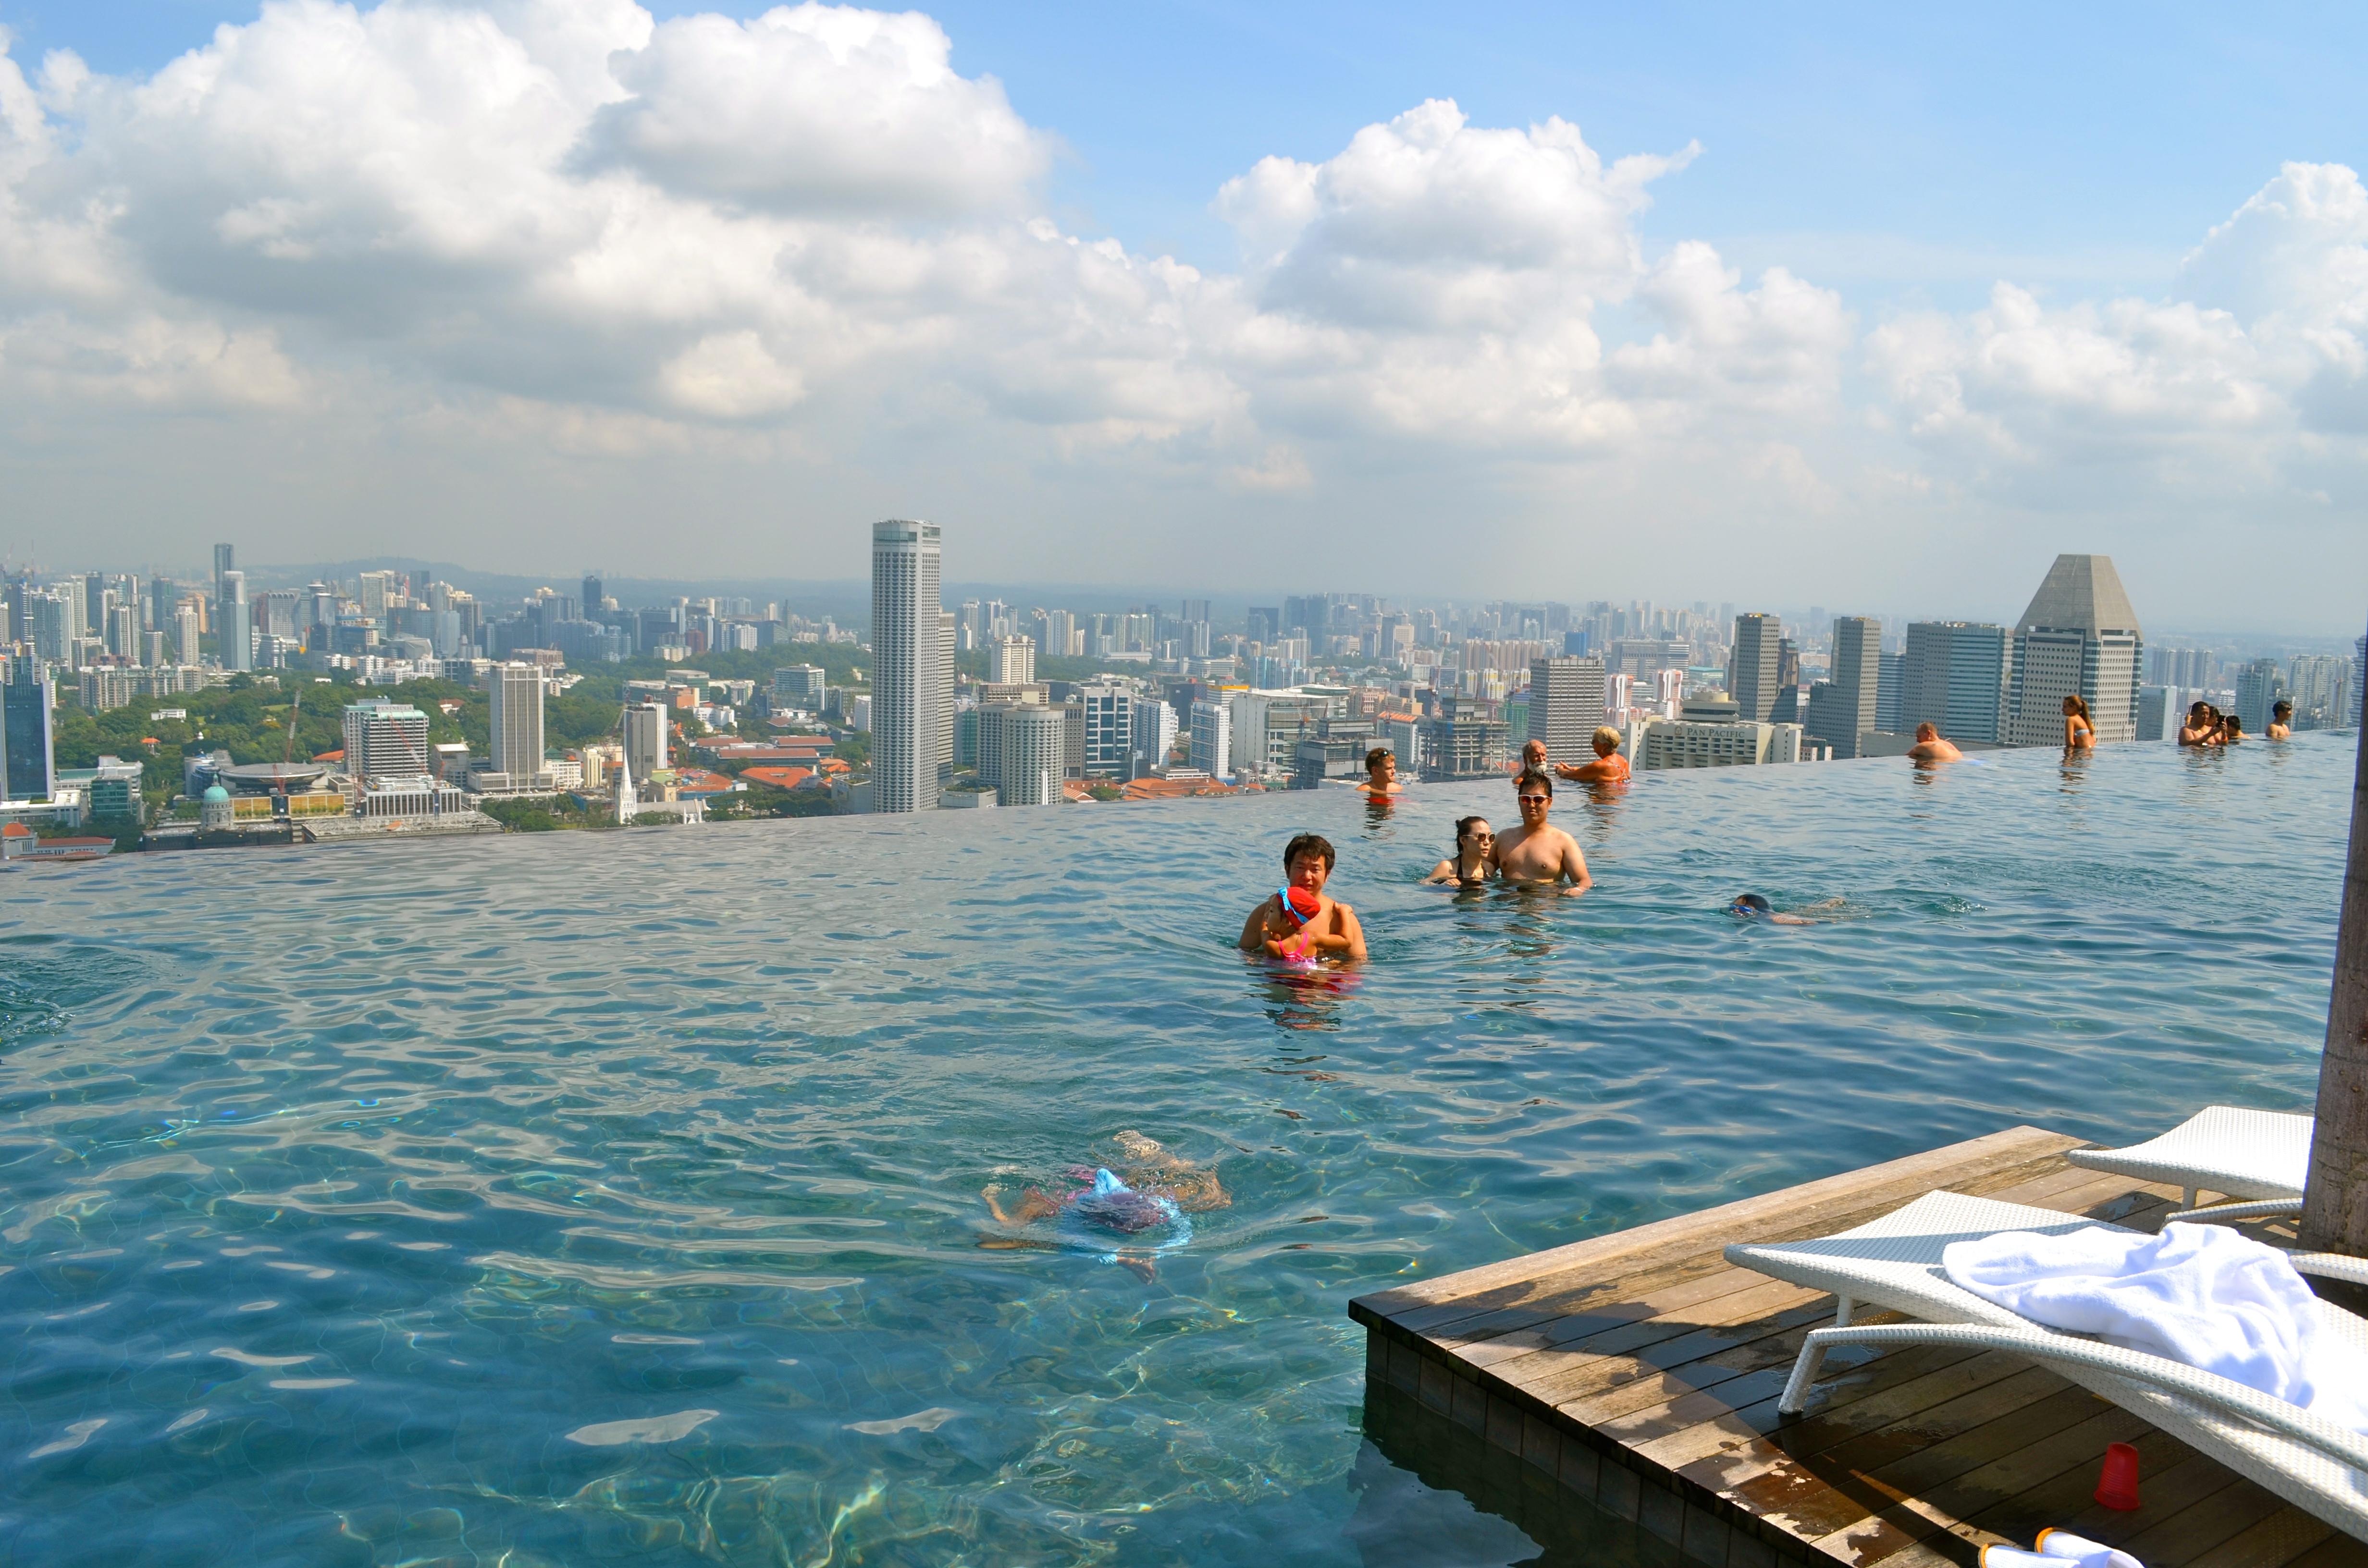 File:SkyPark Infinity Pool (view from deckchair).jpg ...